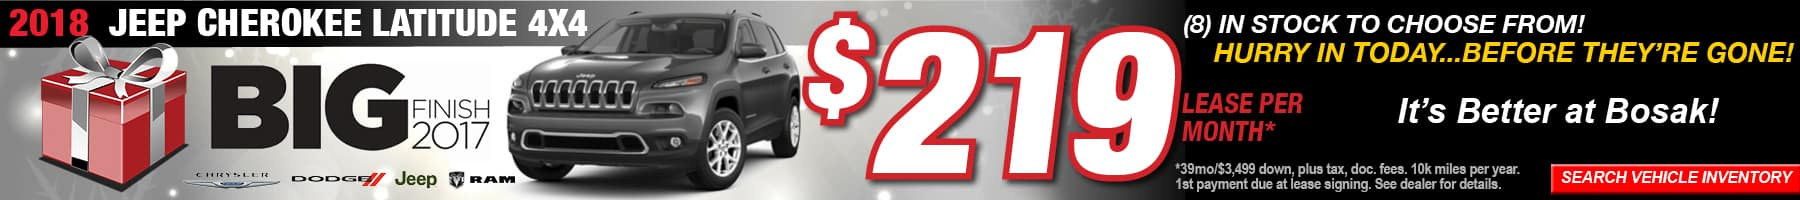 Cherokee Latitude December Offer Bosak Motors